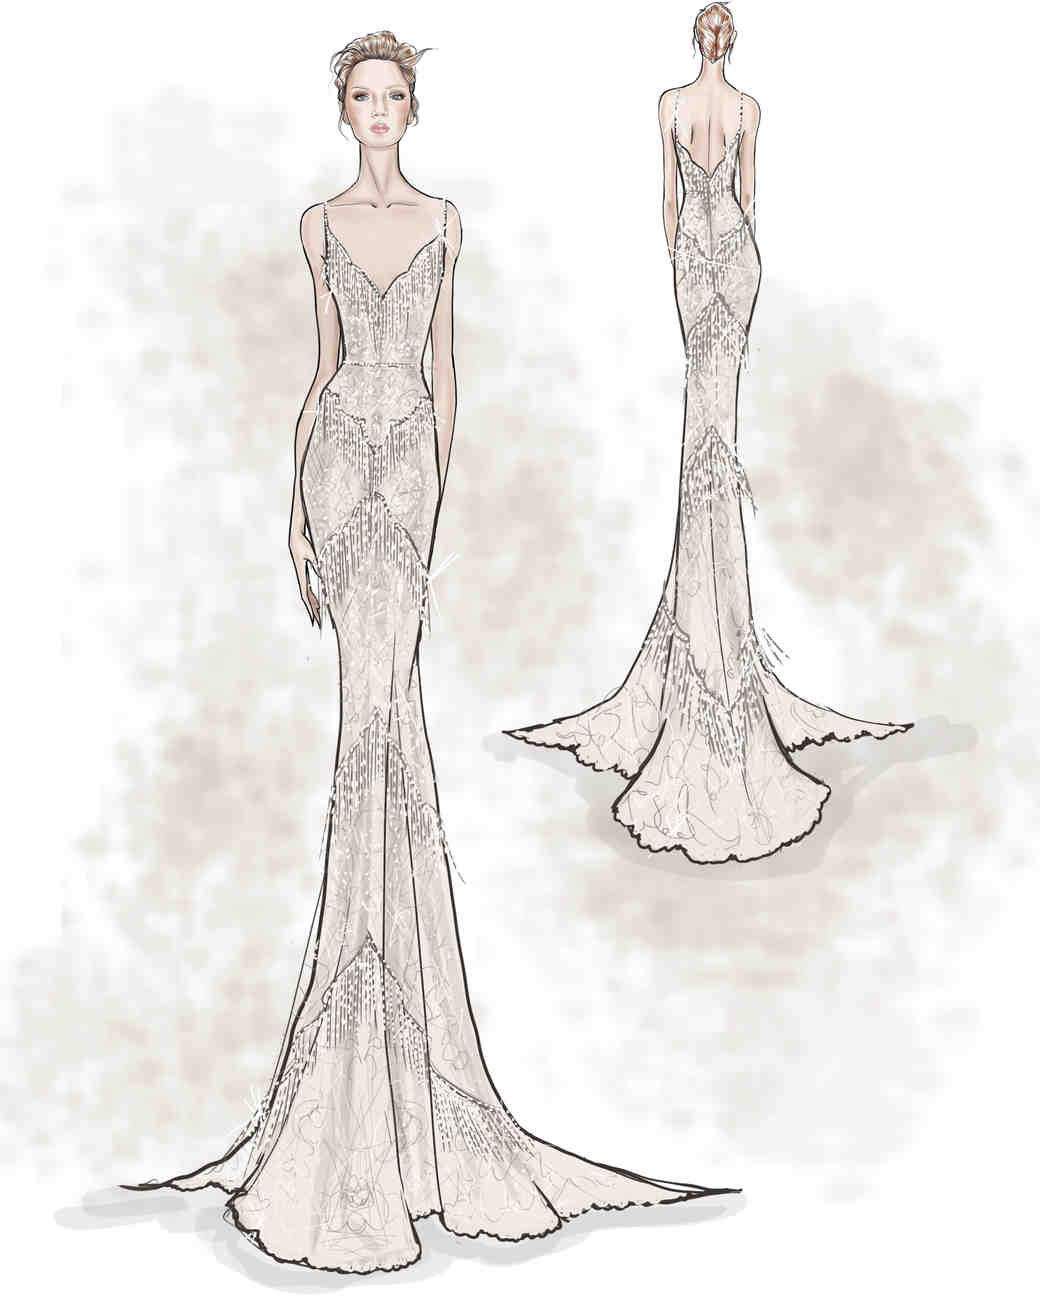 watters-fall-2017-exclusive-wedding-dress-sketch-rides-ferrera-0916.jpg